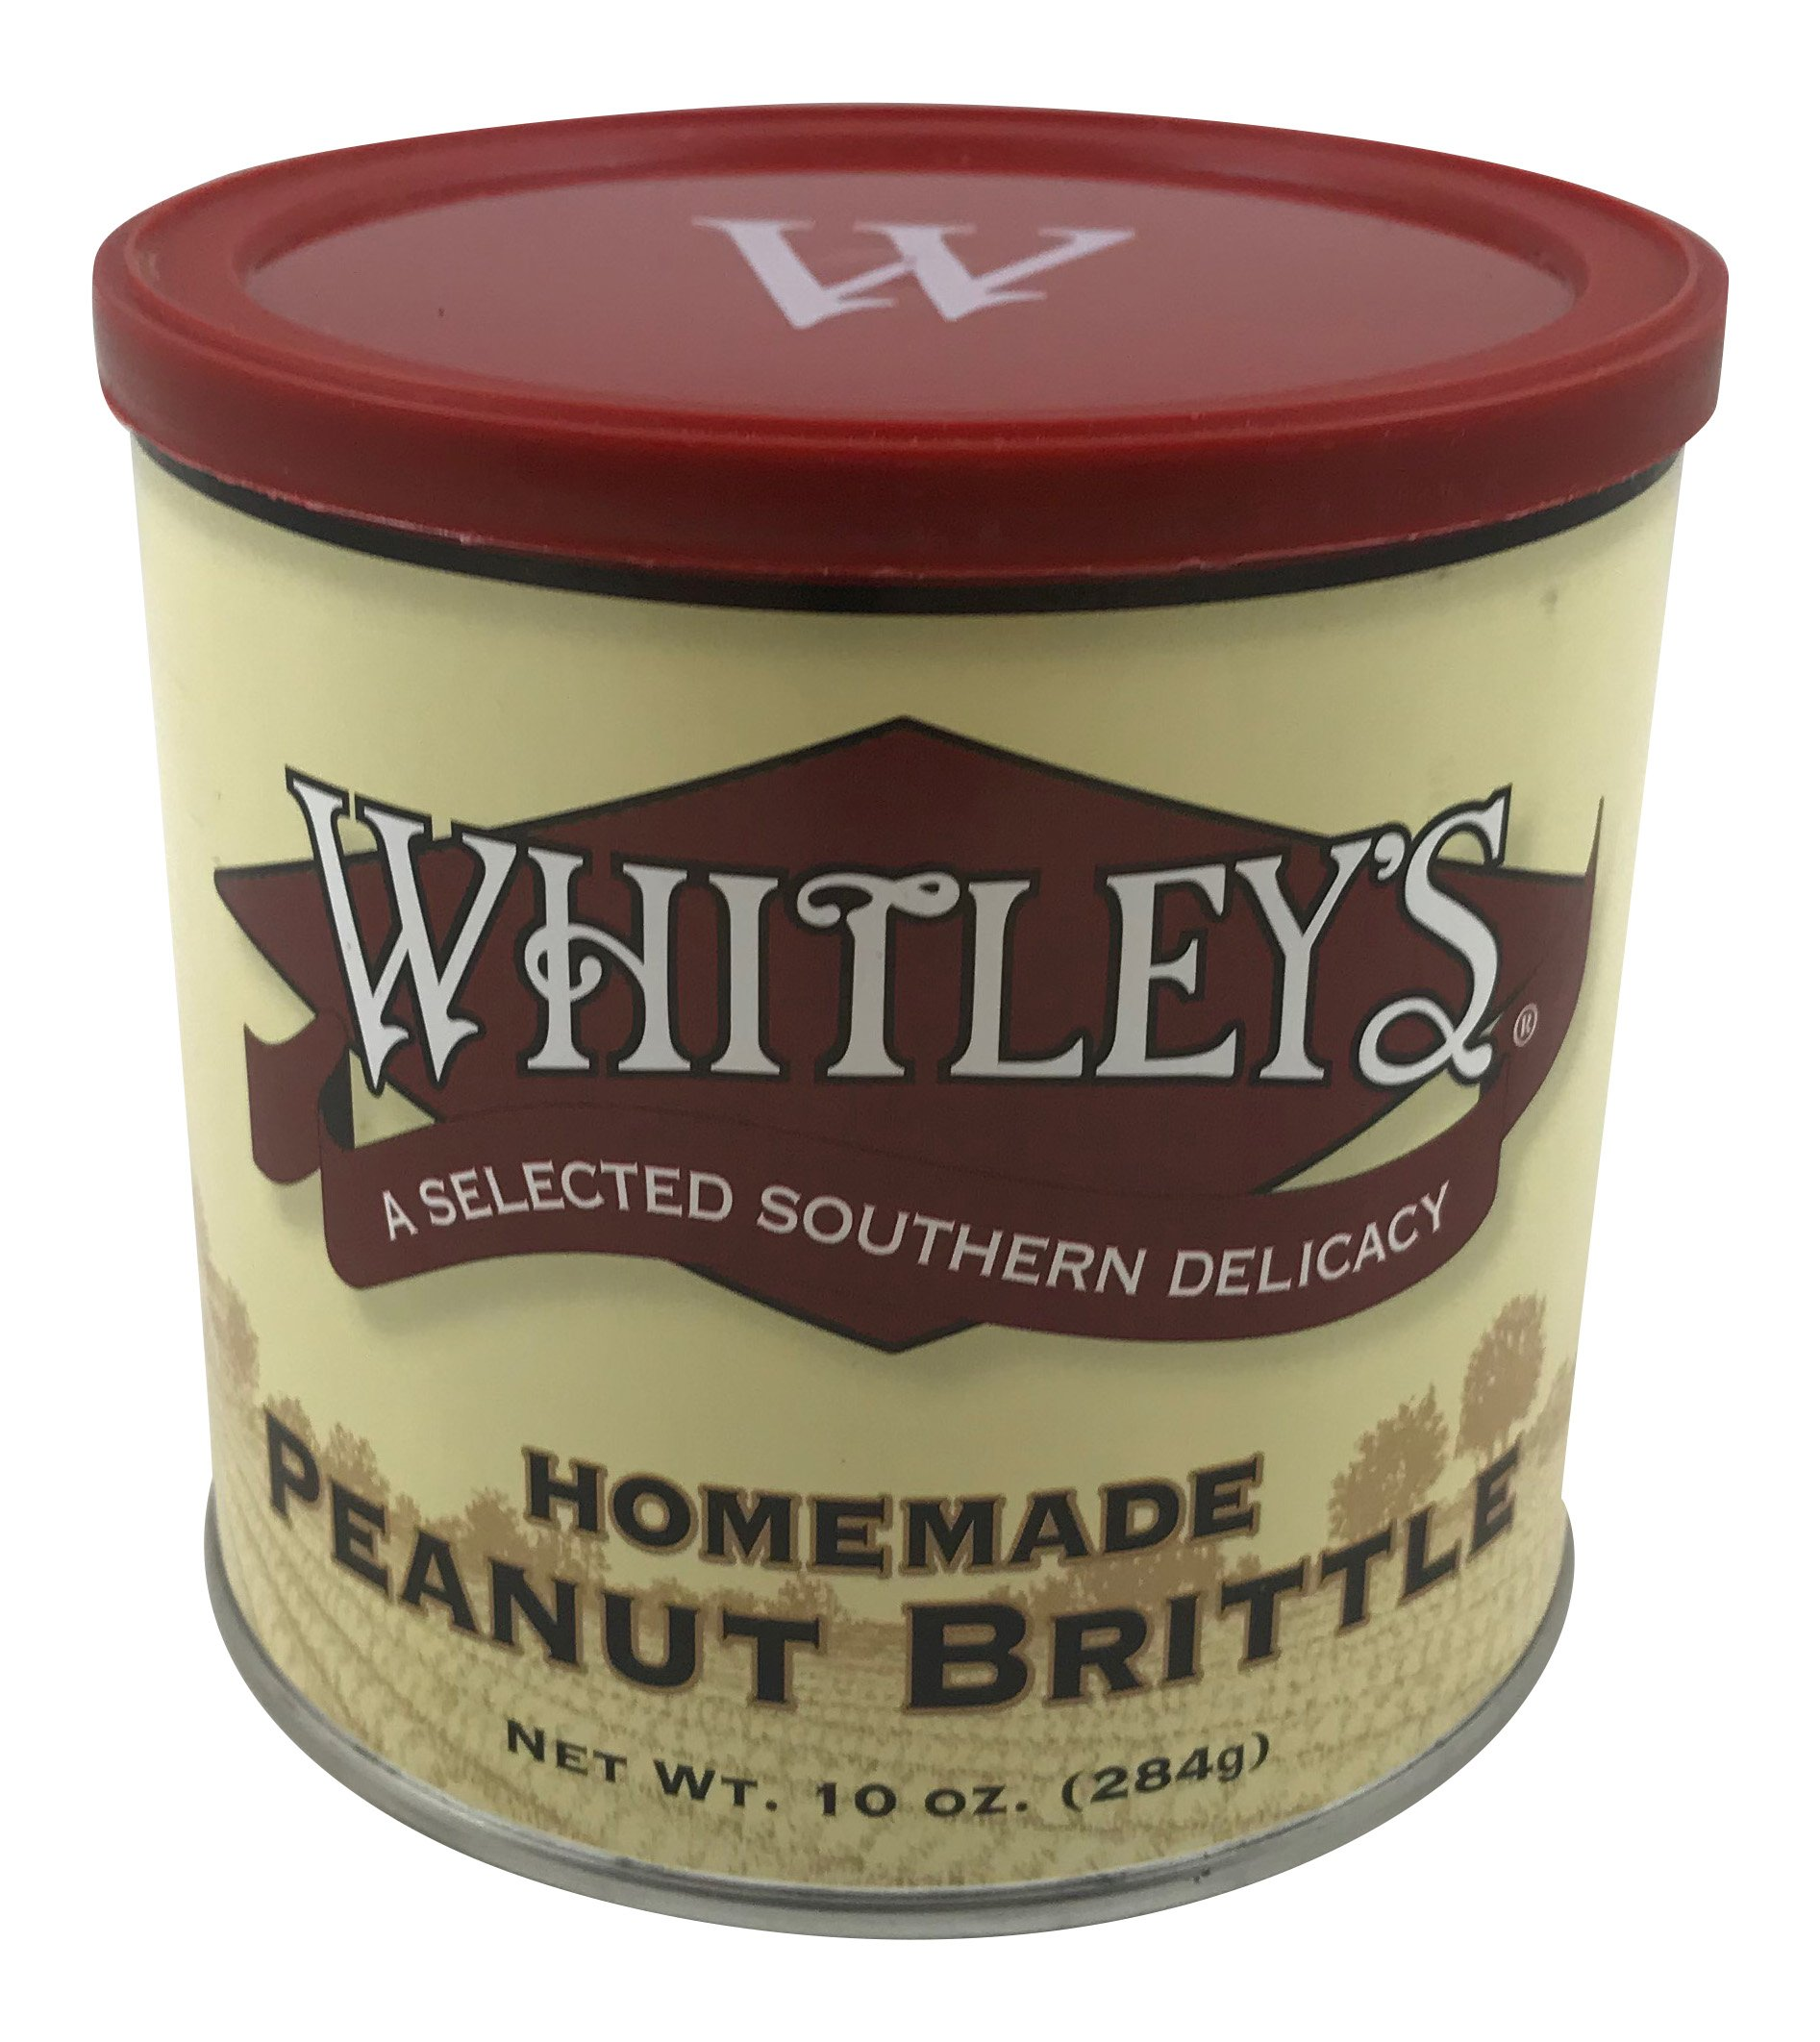 Whitley's Homemade Peanut Brittle 10 Ounce Tin